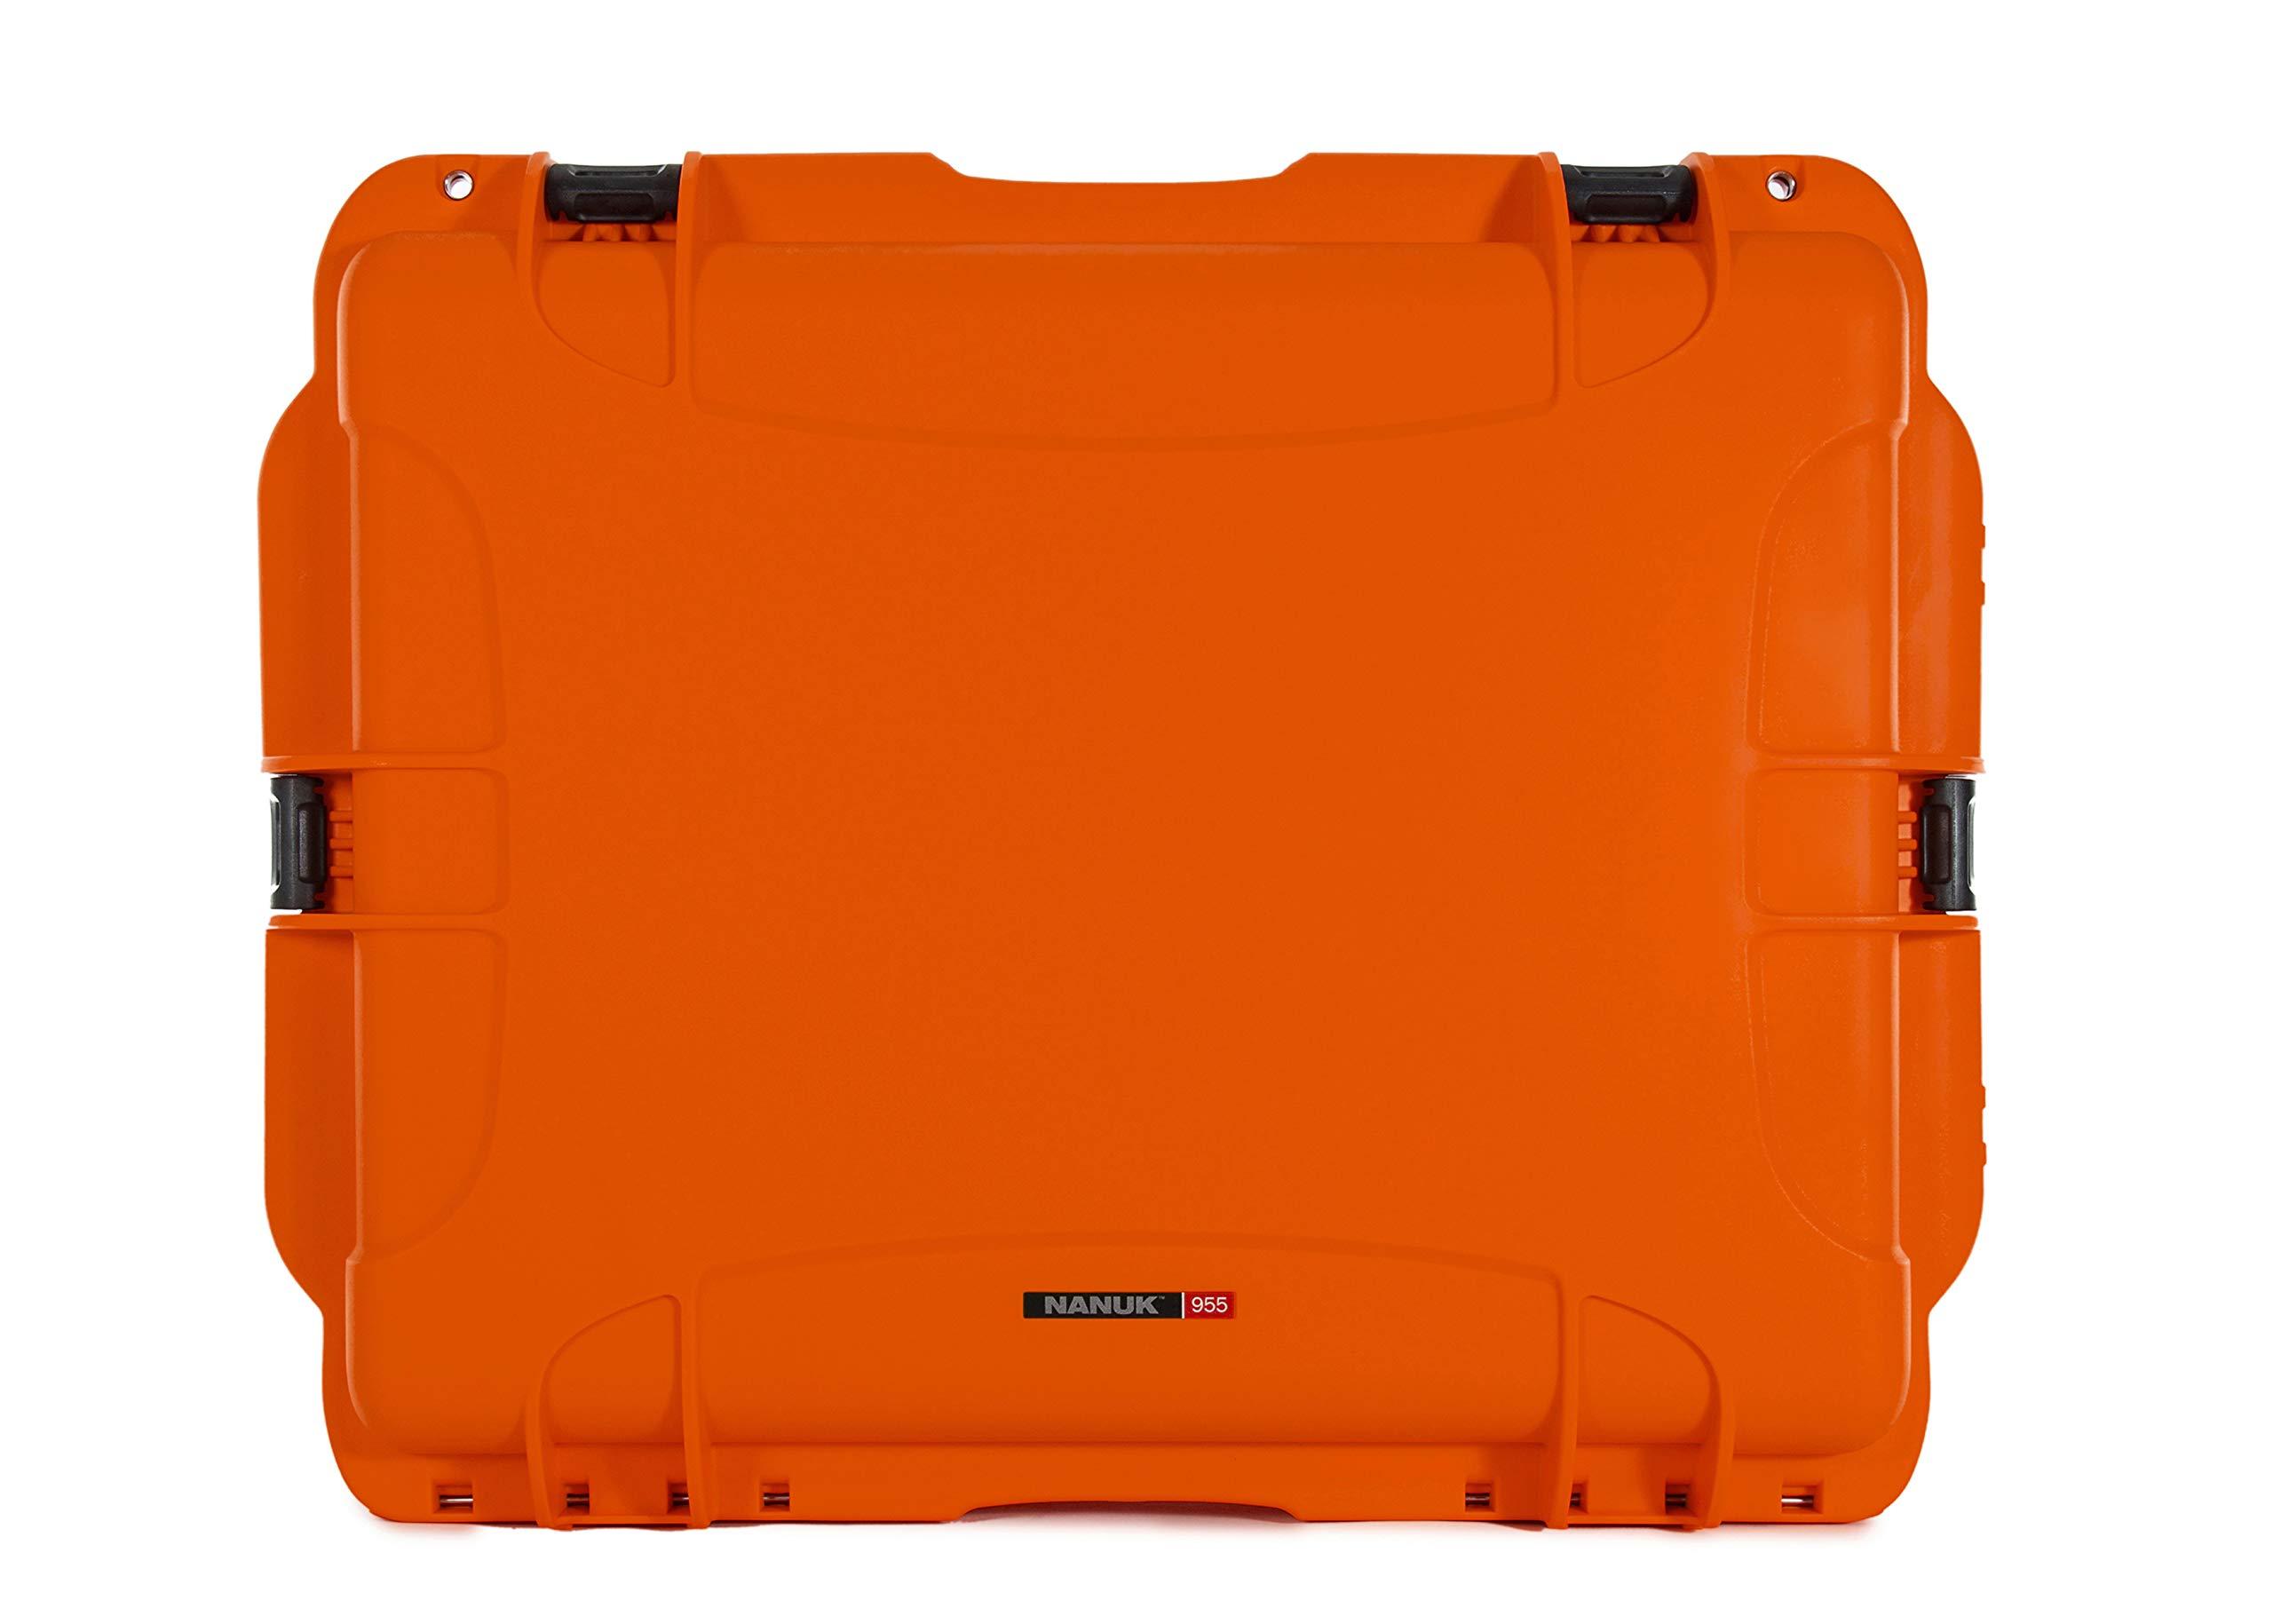 Nanuk 955 Waterproof Hard Case with Wheels and Foam Insert - Orange by Nanuk